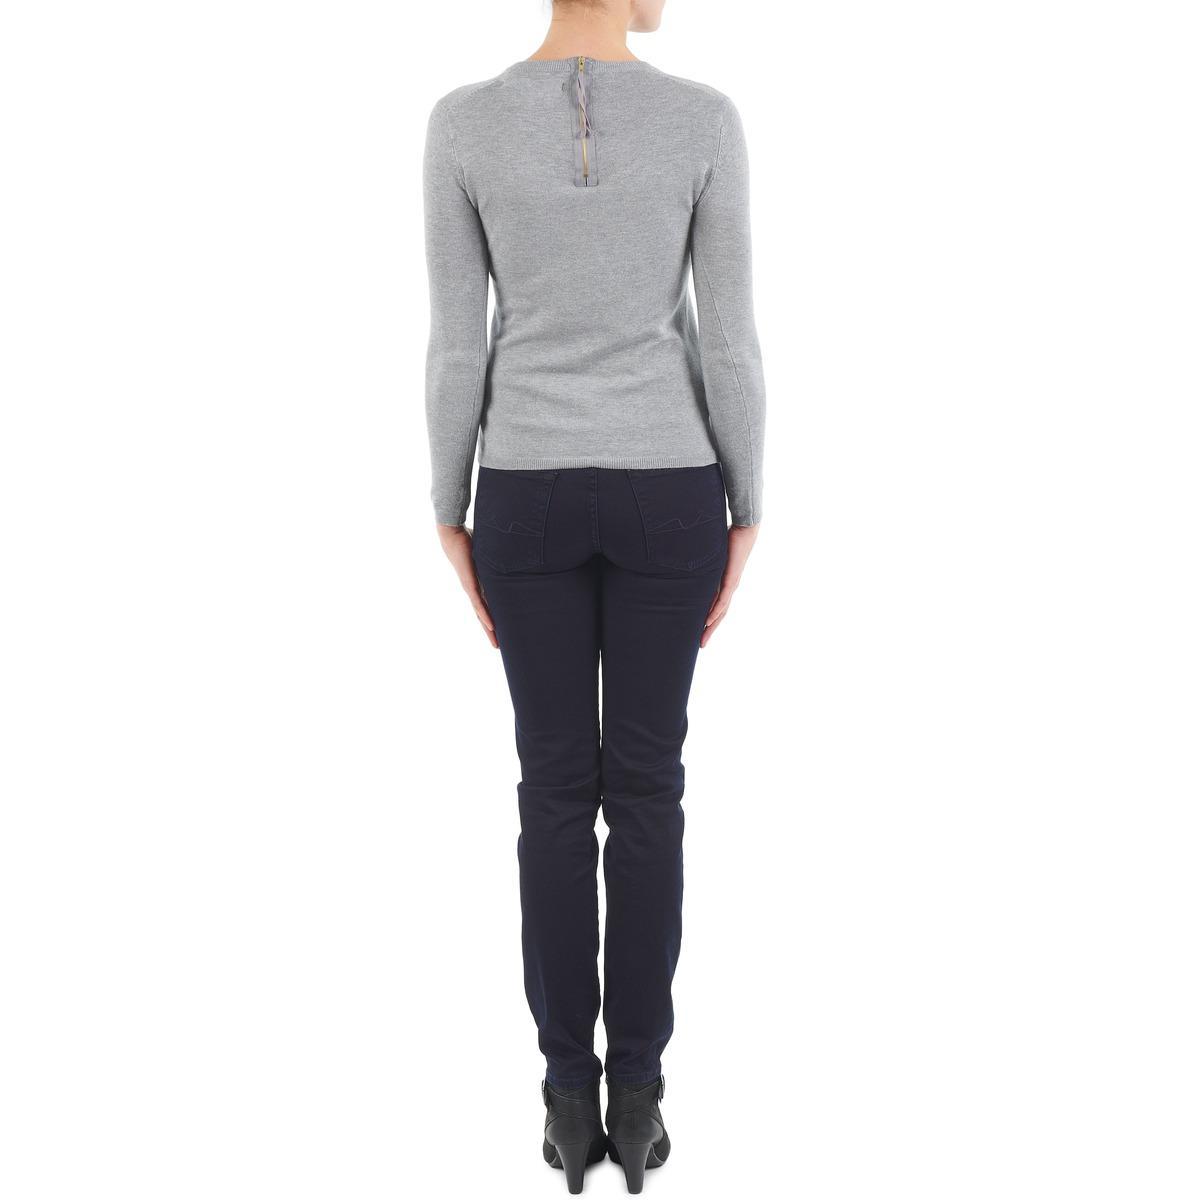 7 For All Mankind Denim Gummy Women's Skinny Jeans In Black - Save 10%